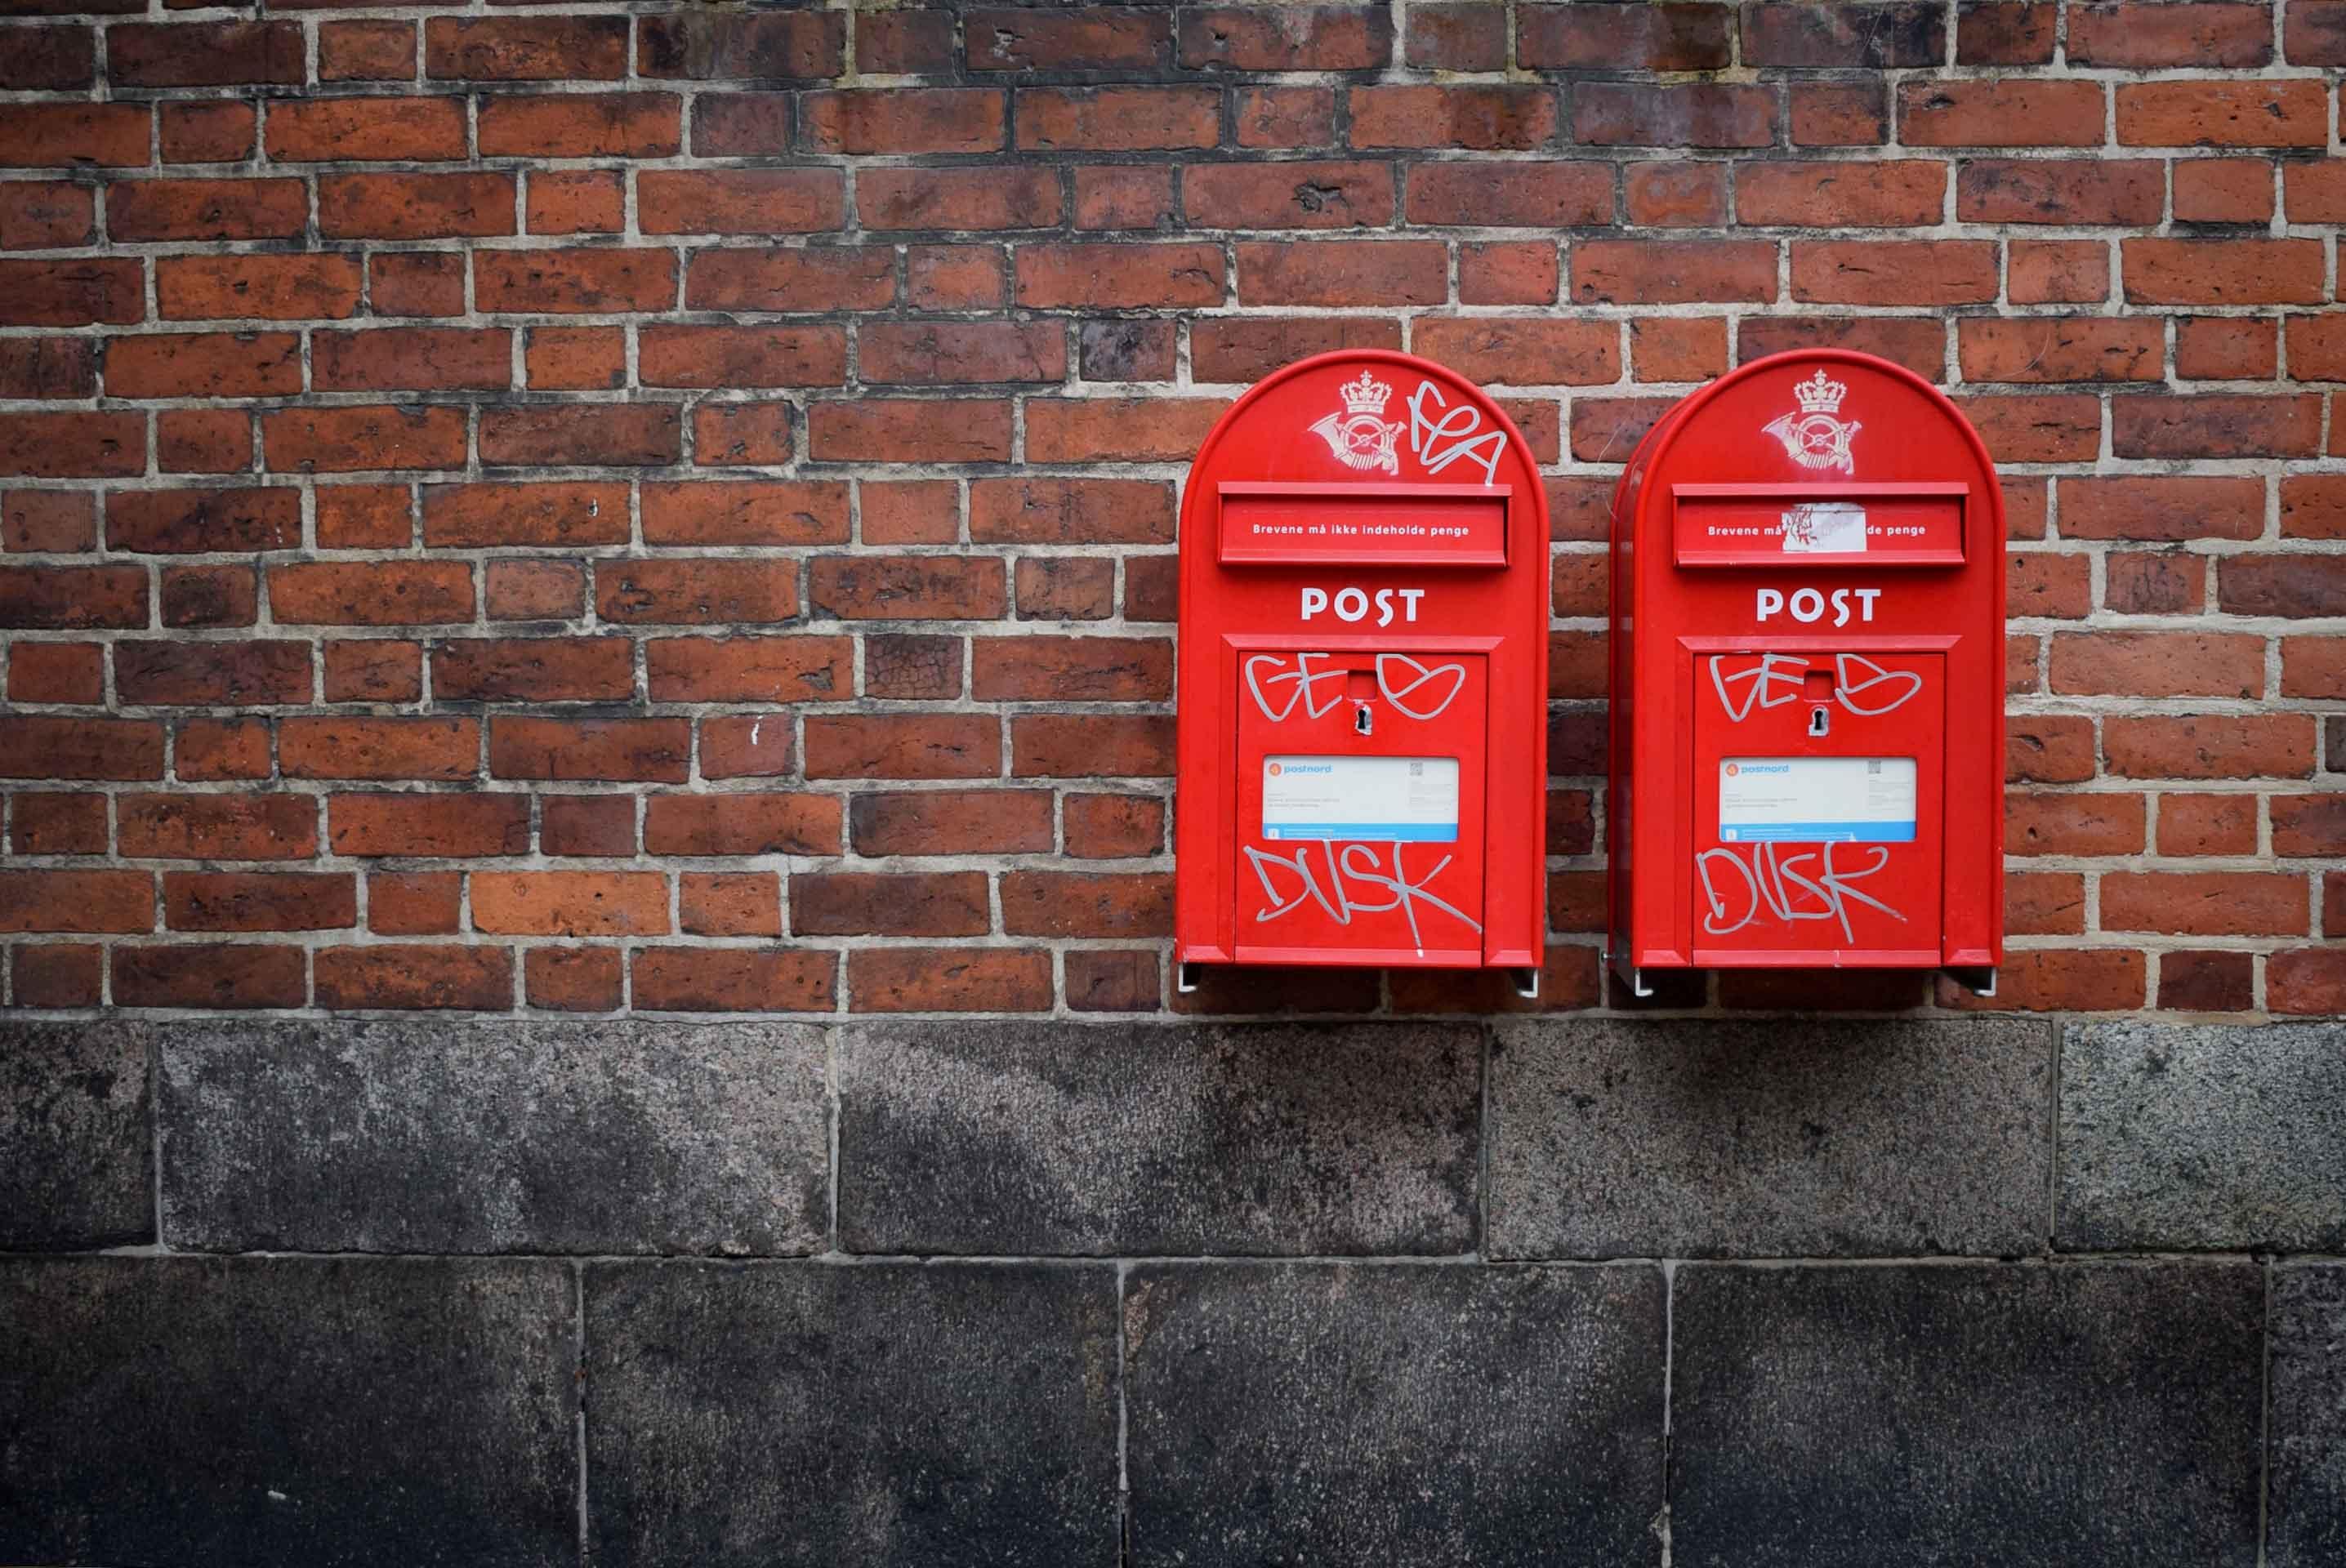 post, postkasse, postkasser, røde postkasser. (Foto: Unsplash)